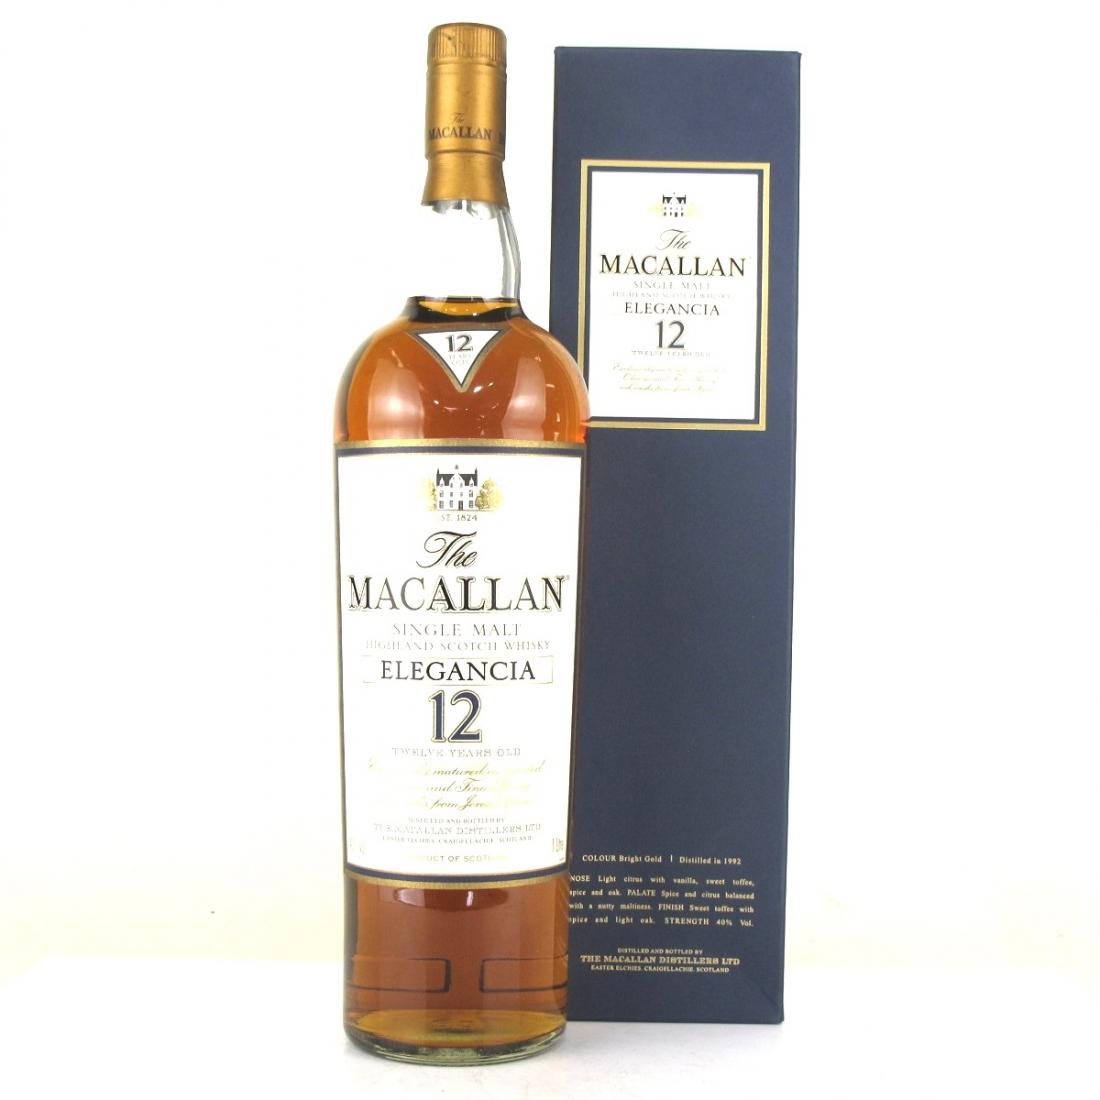 Macallan 12 Year Old Elegancia 1 Litre